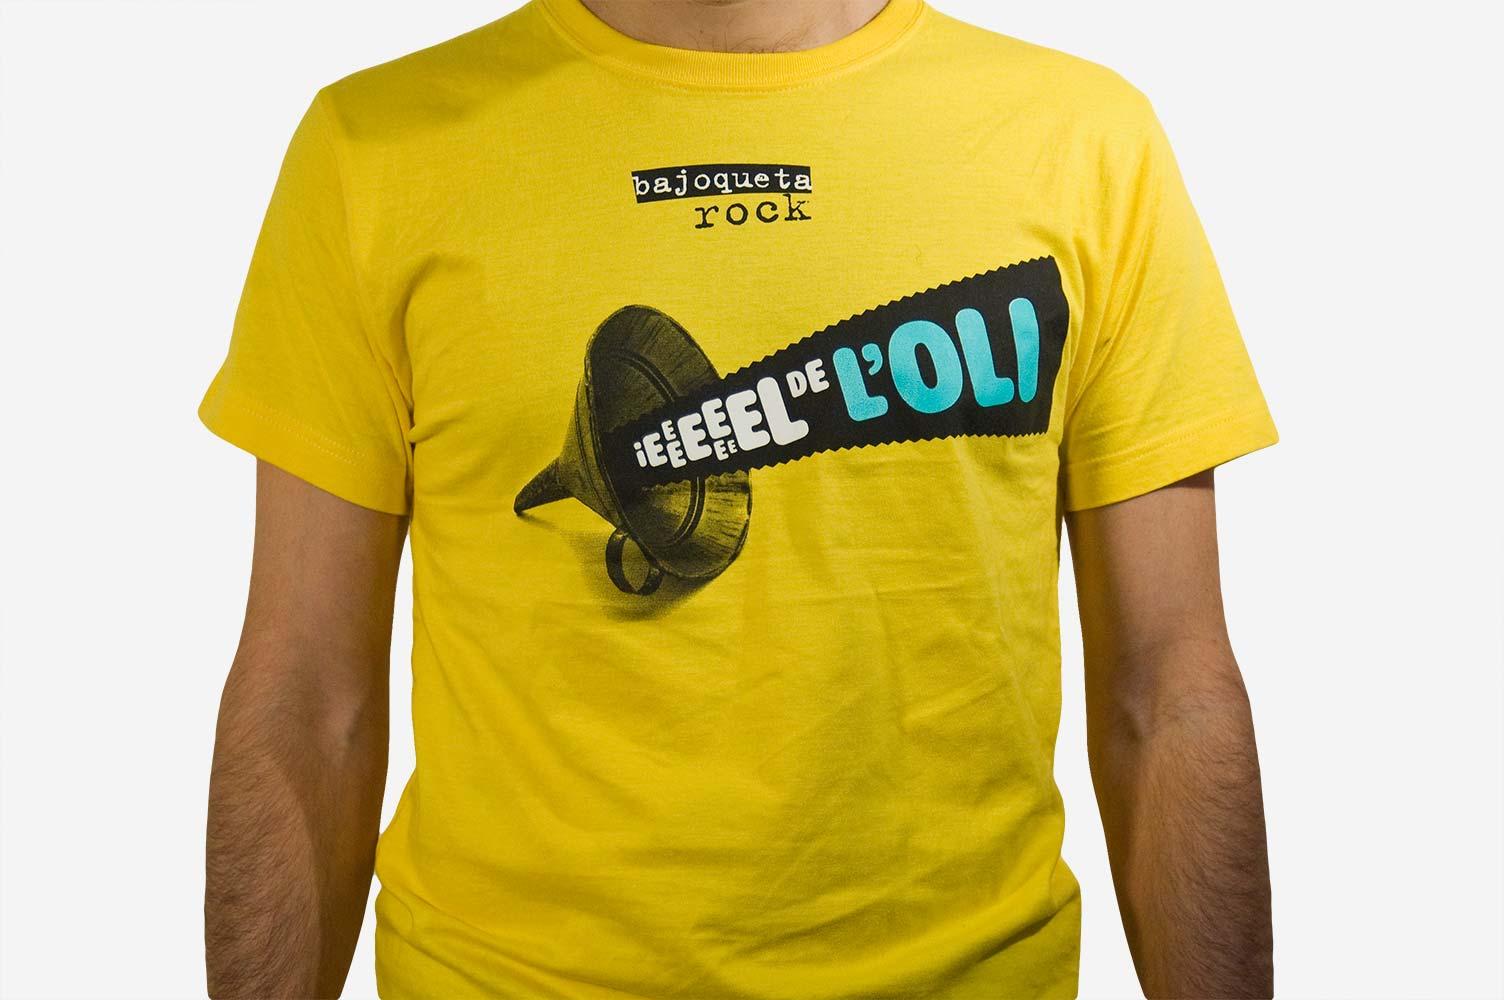 "Diseño camiseta ""El del oli"" Bajoqueta rock"